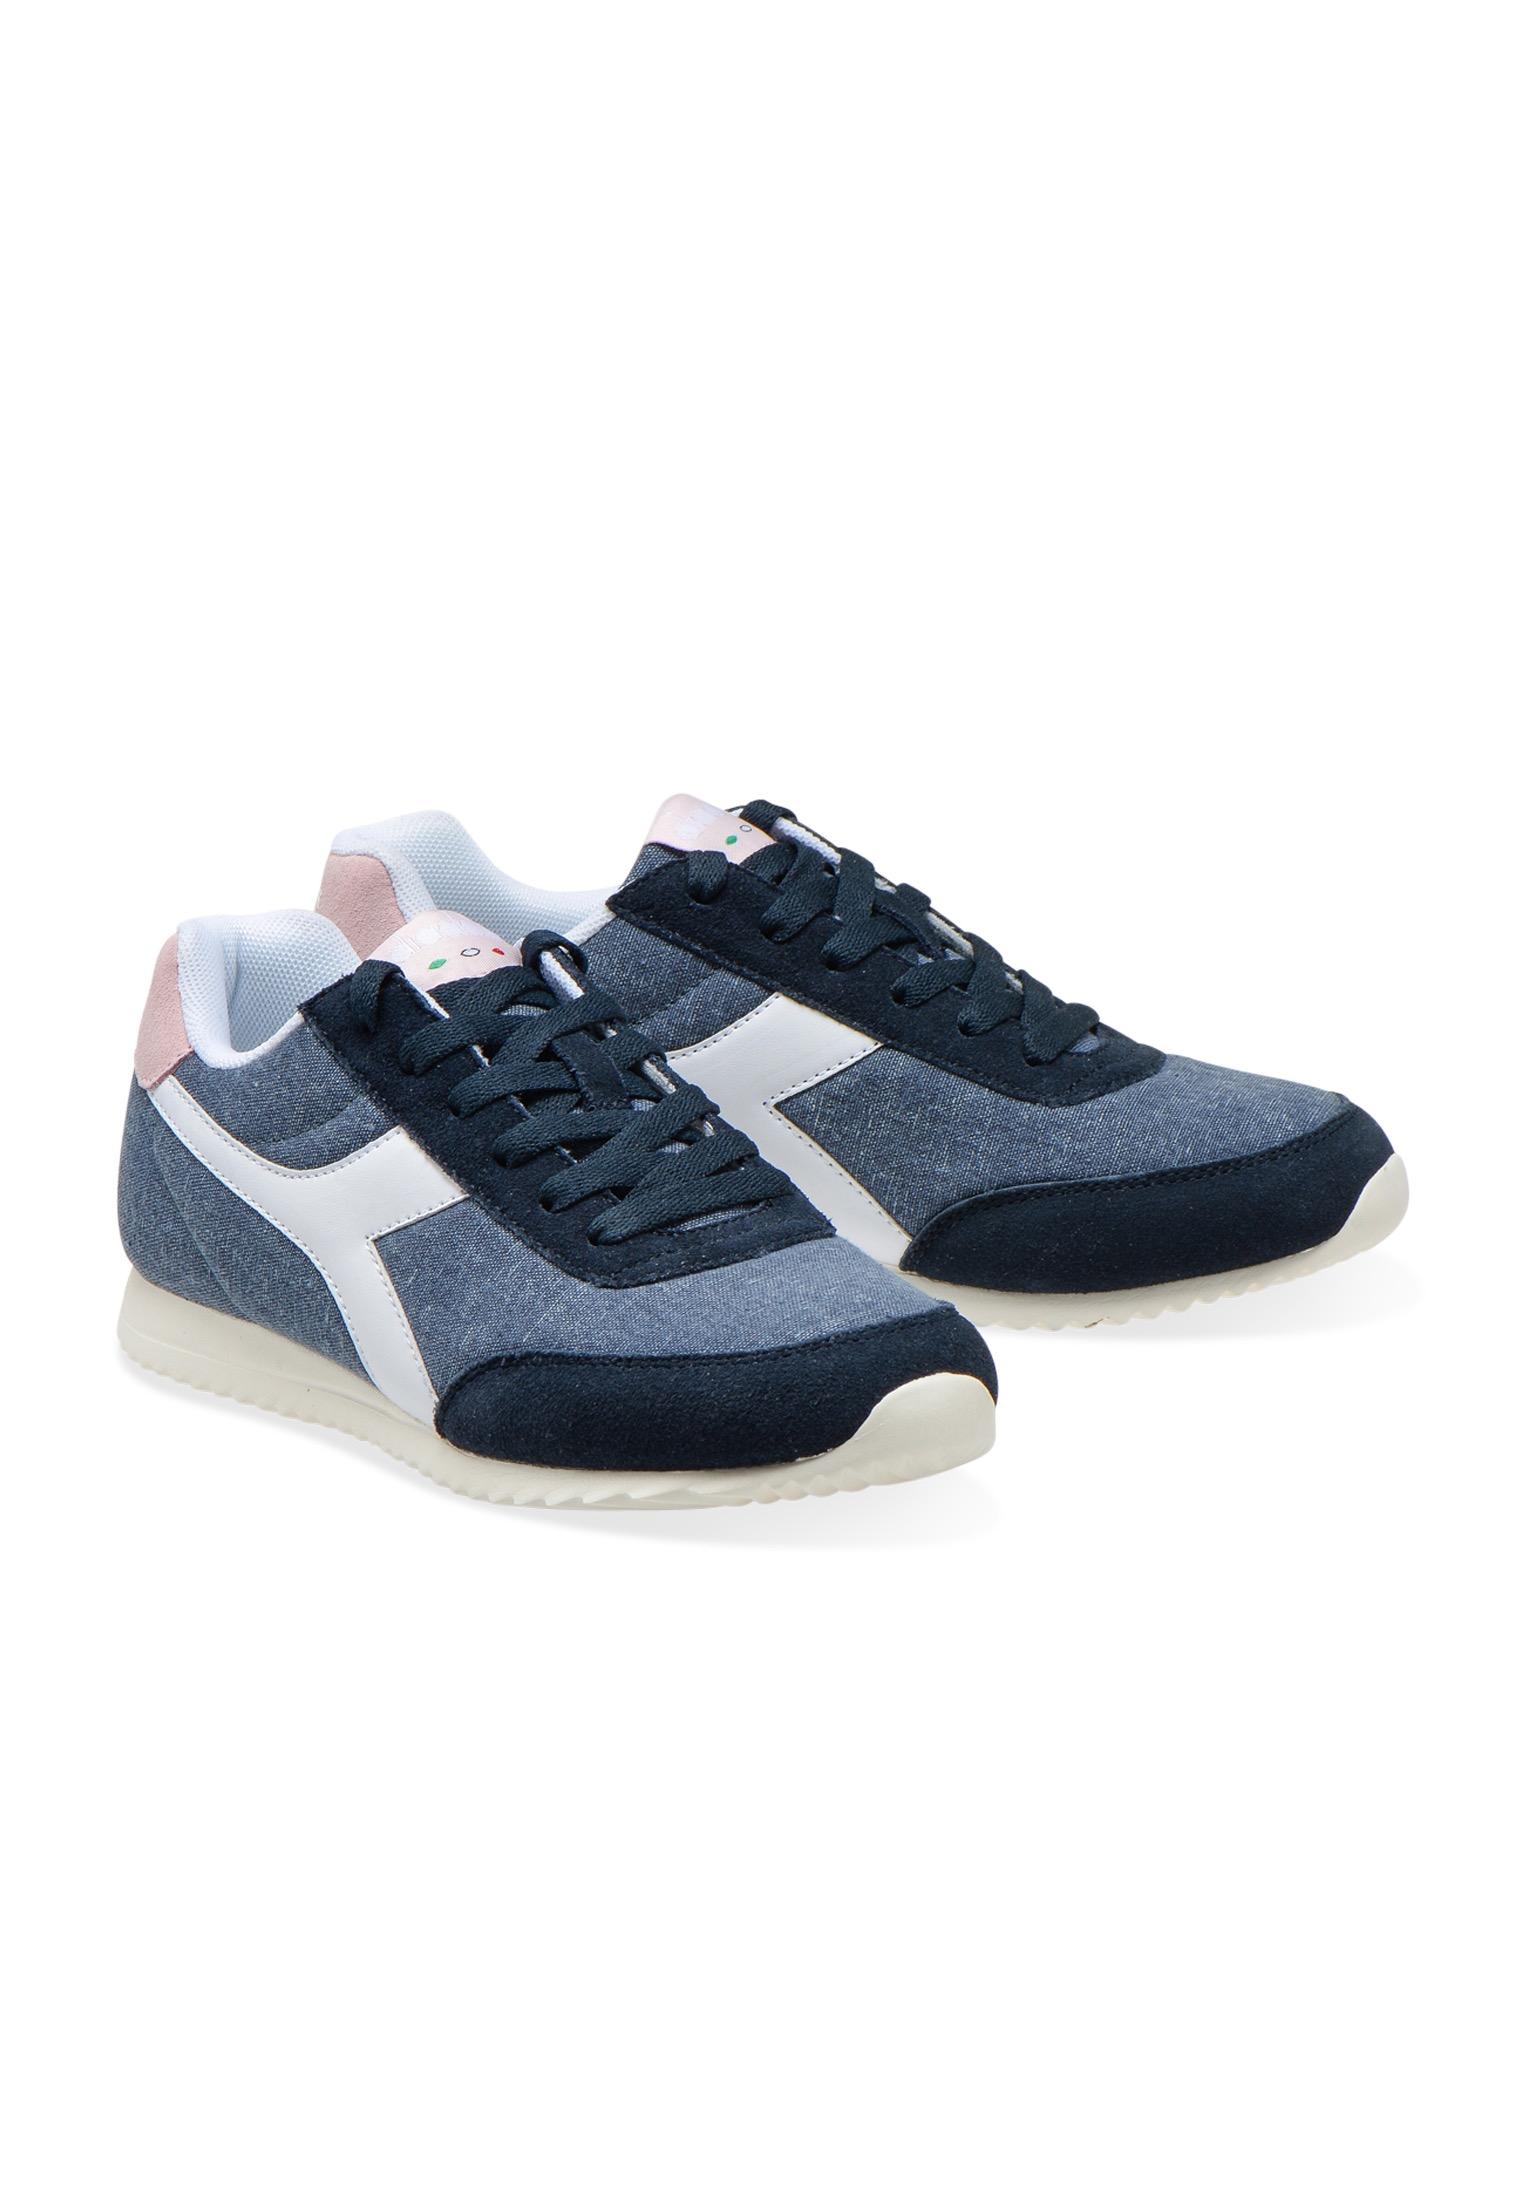 Scarpe-Diadora-Jog-Light-C-Sneakers-sportive-uomo-donna-vari-colori-e-taglie miniatura 53